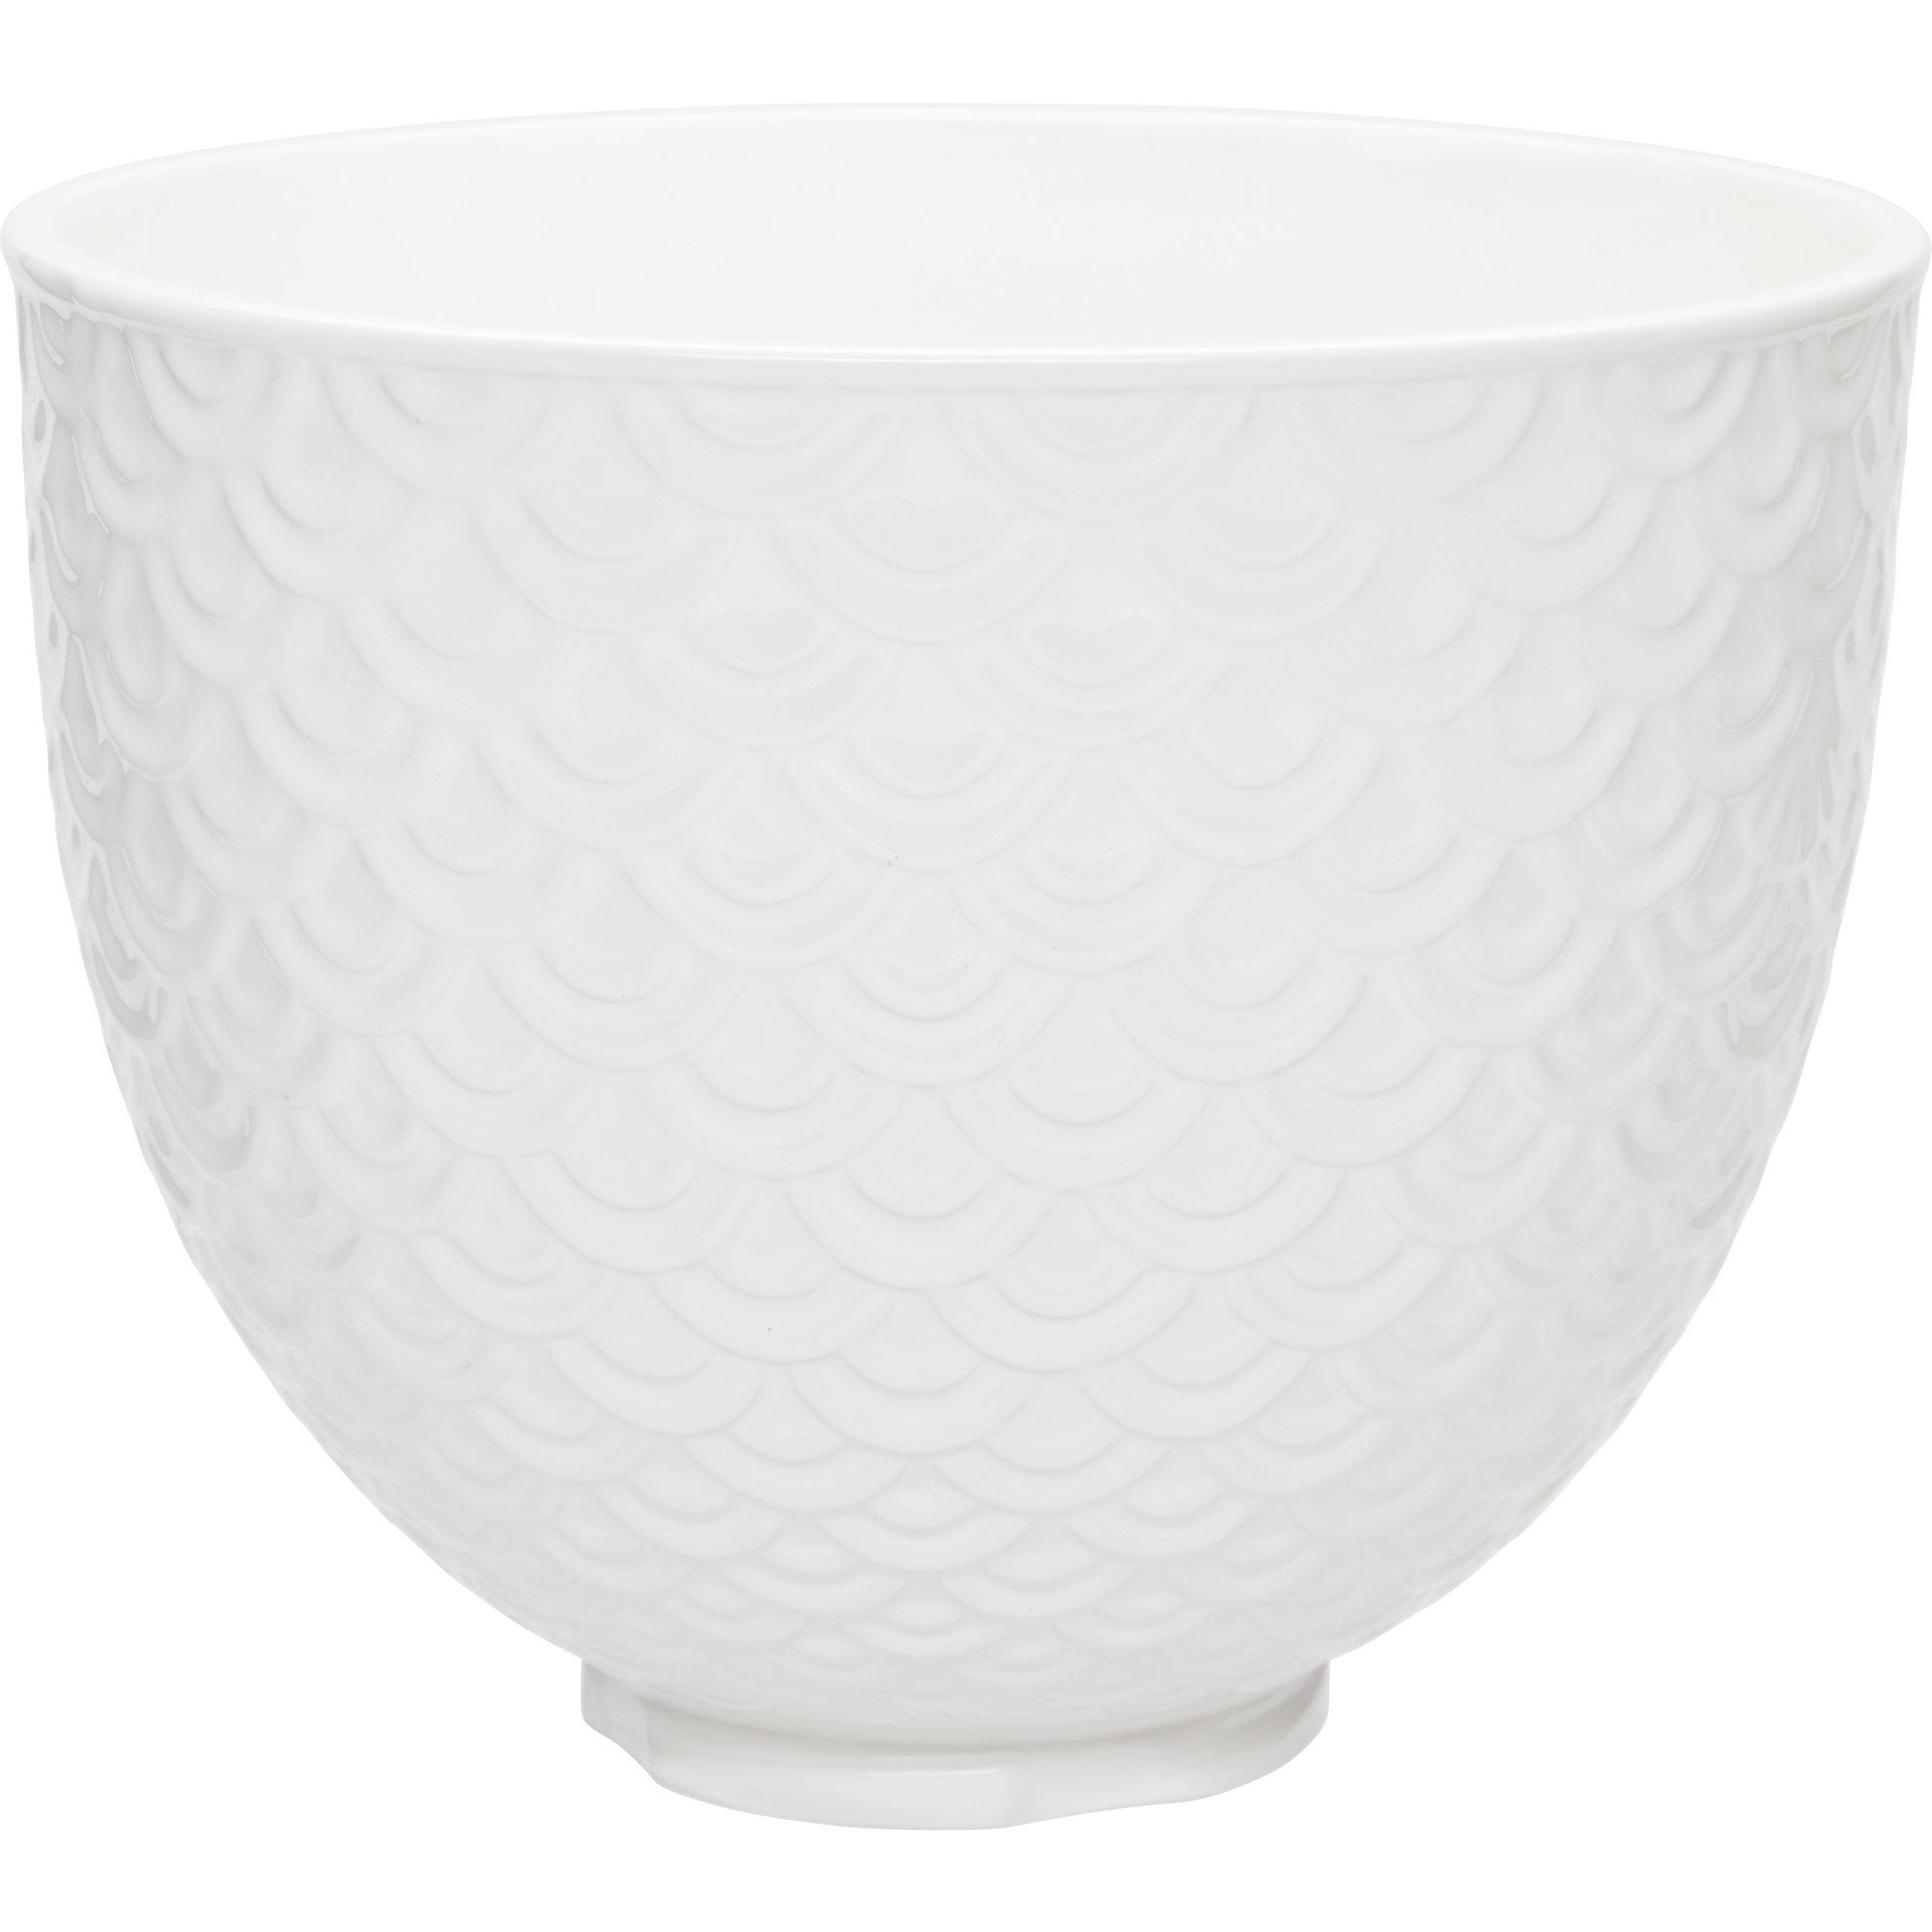 KitchenAid Keramikskål Mermaid Lace White 47 L